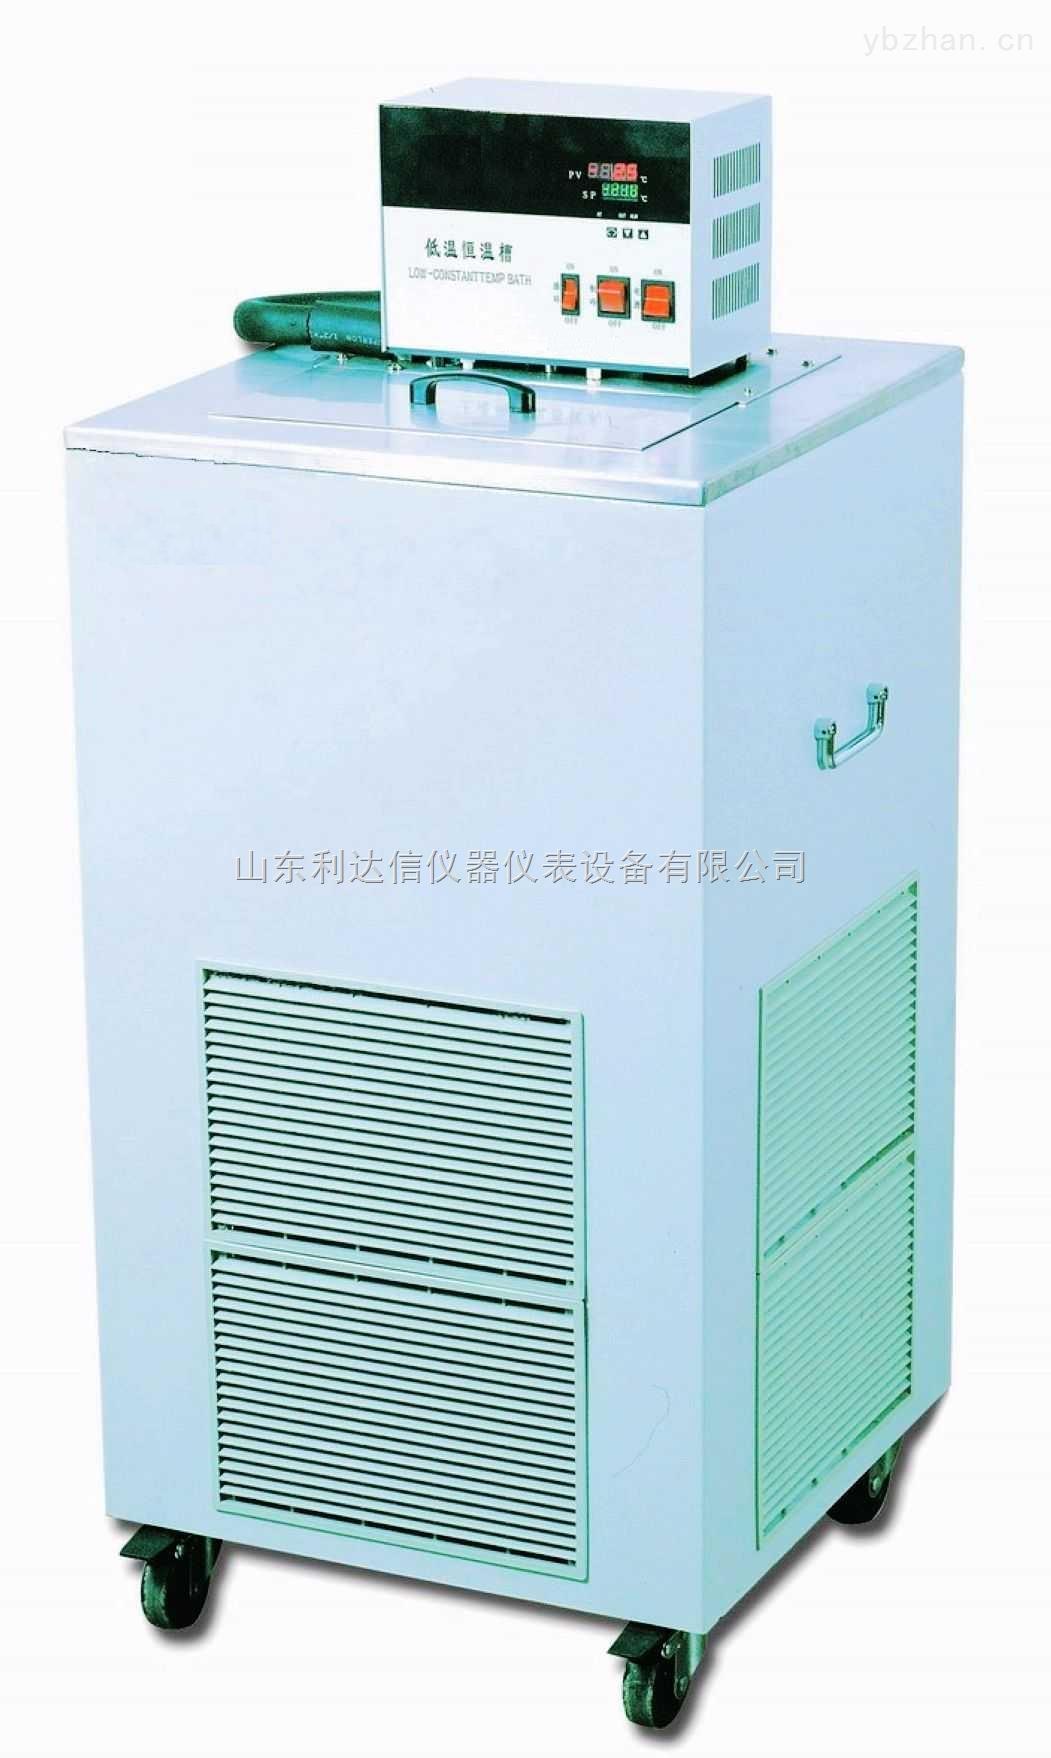 LDX-DC-8006-超低溫恒溫槽